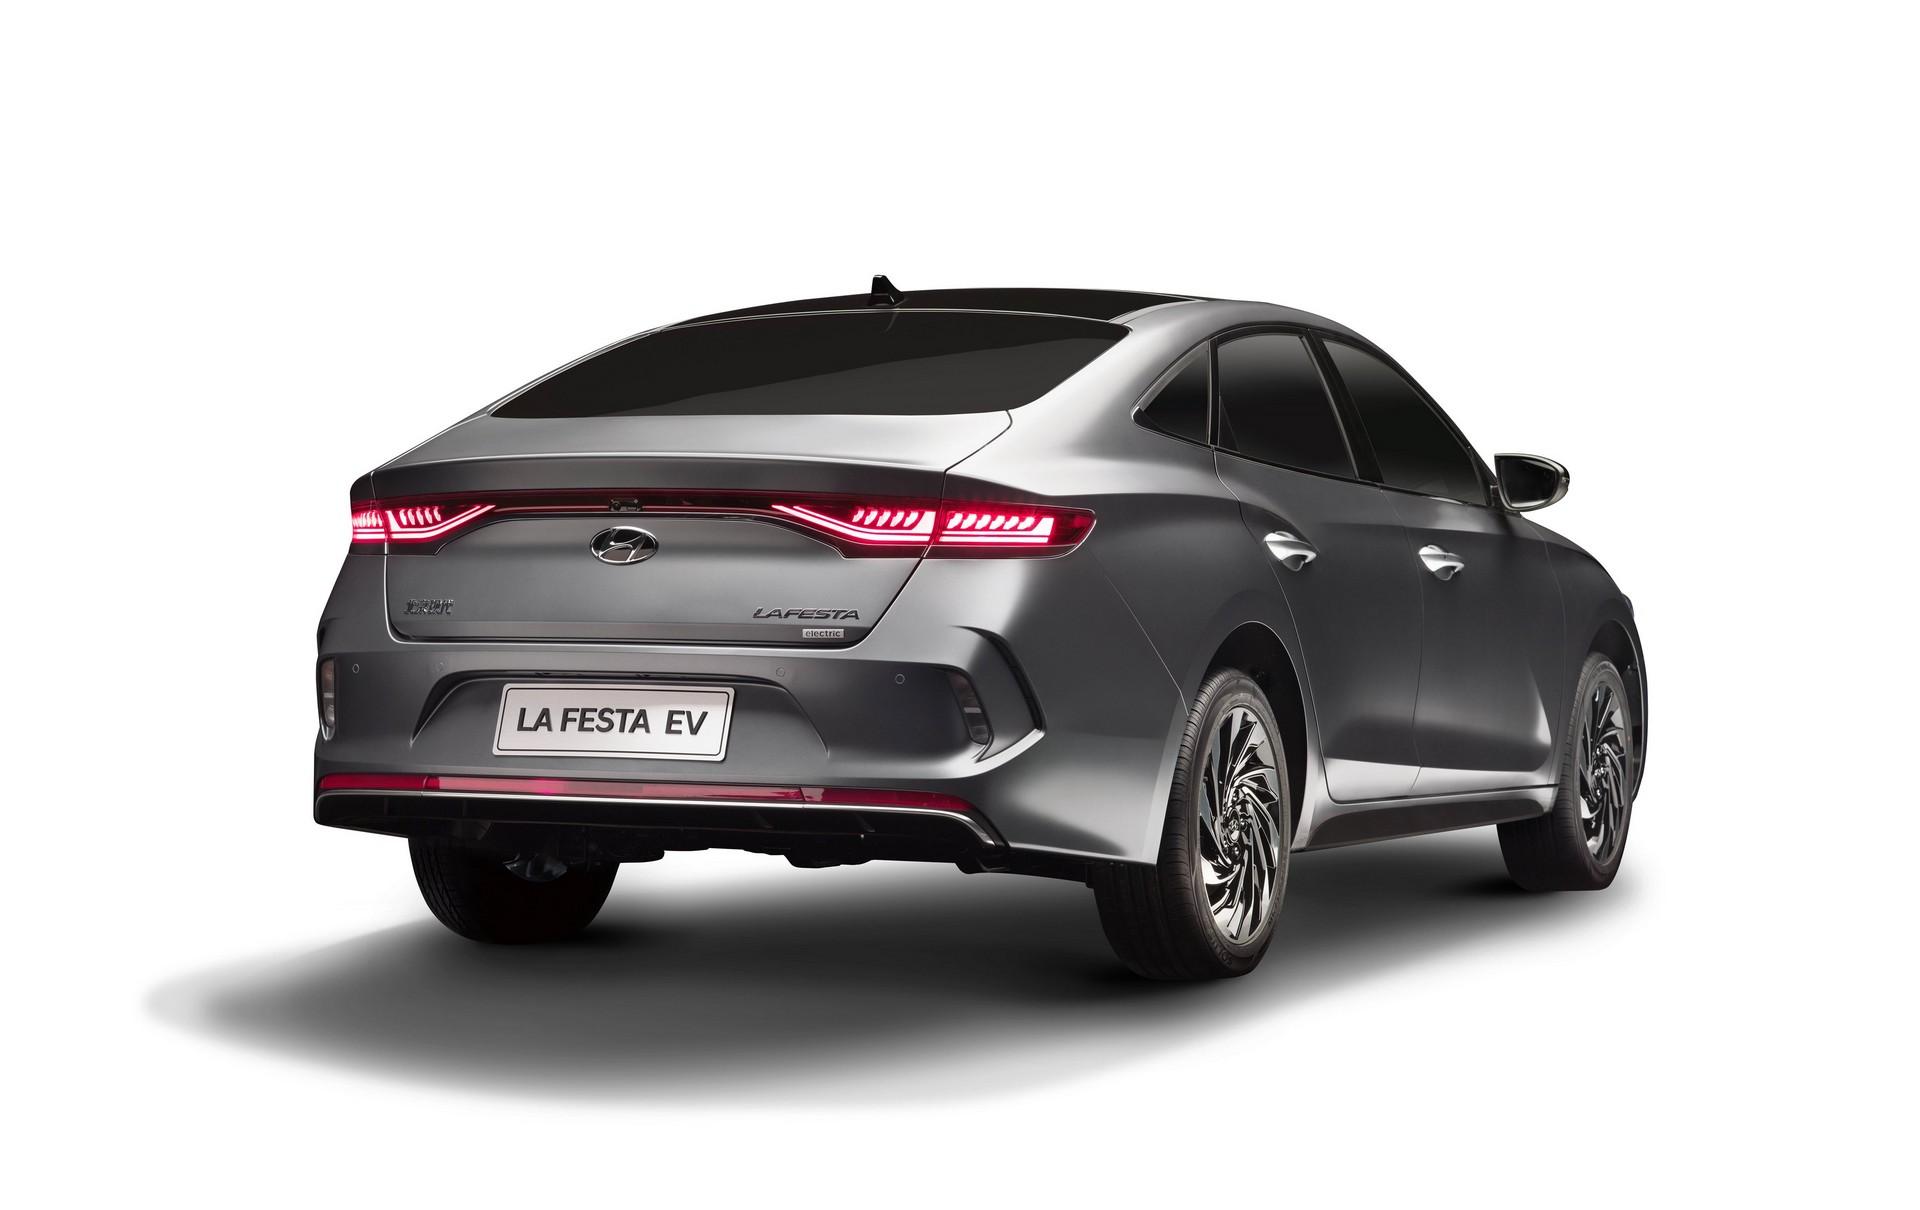 Hyundai_Lafesta_electric_0003